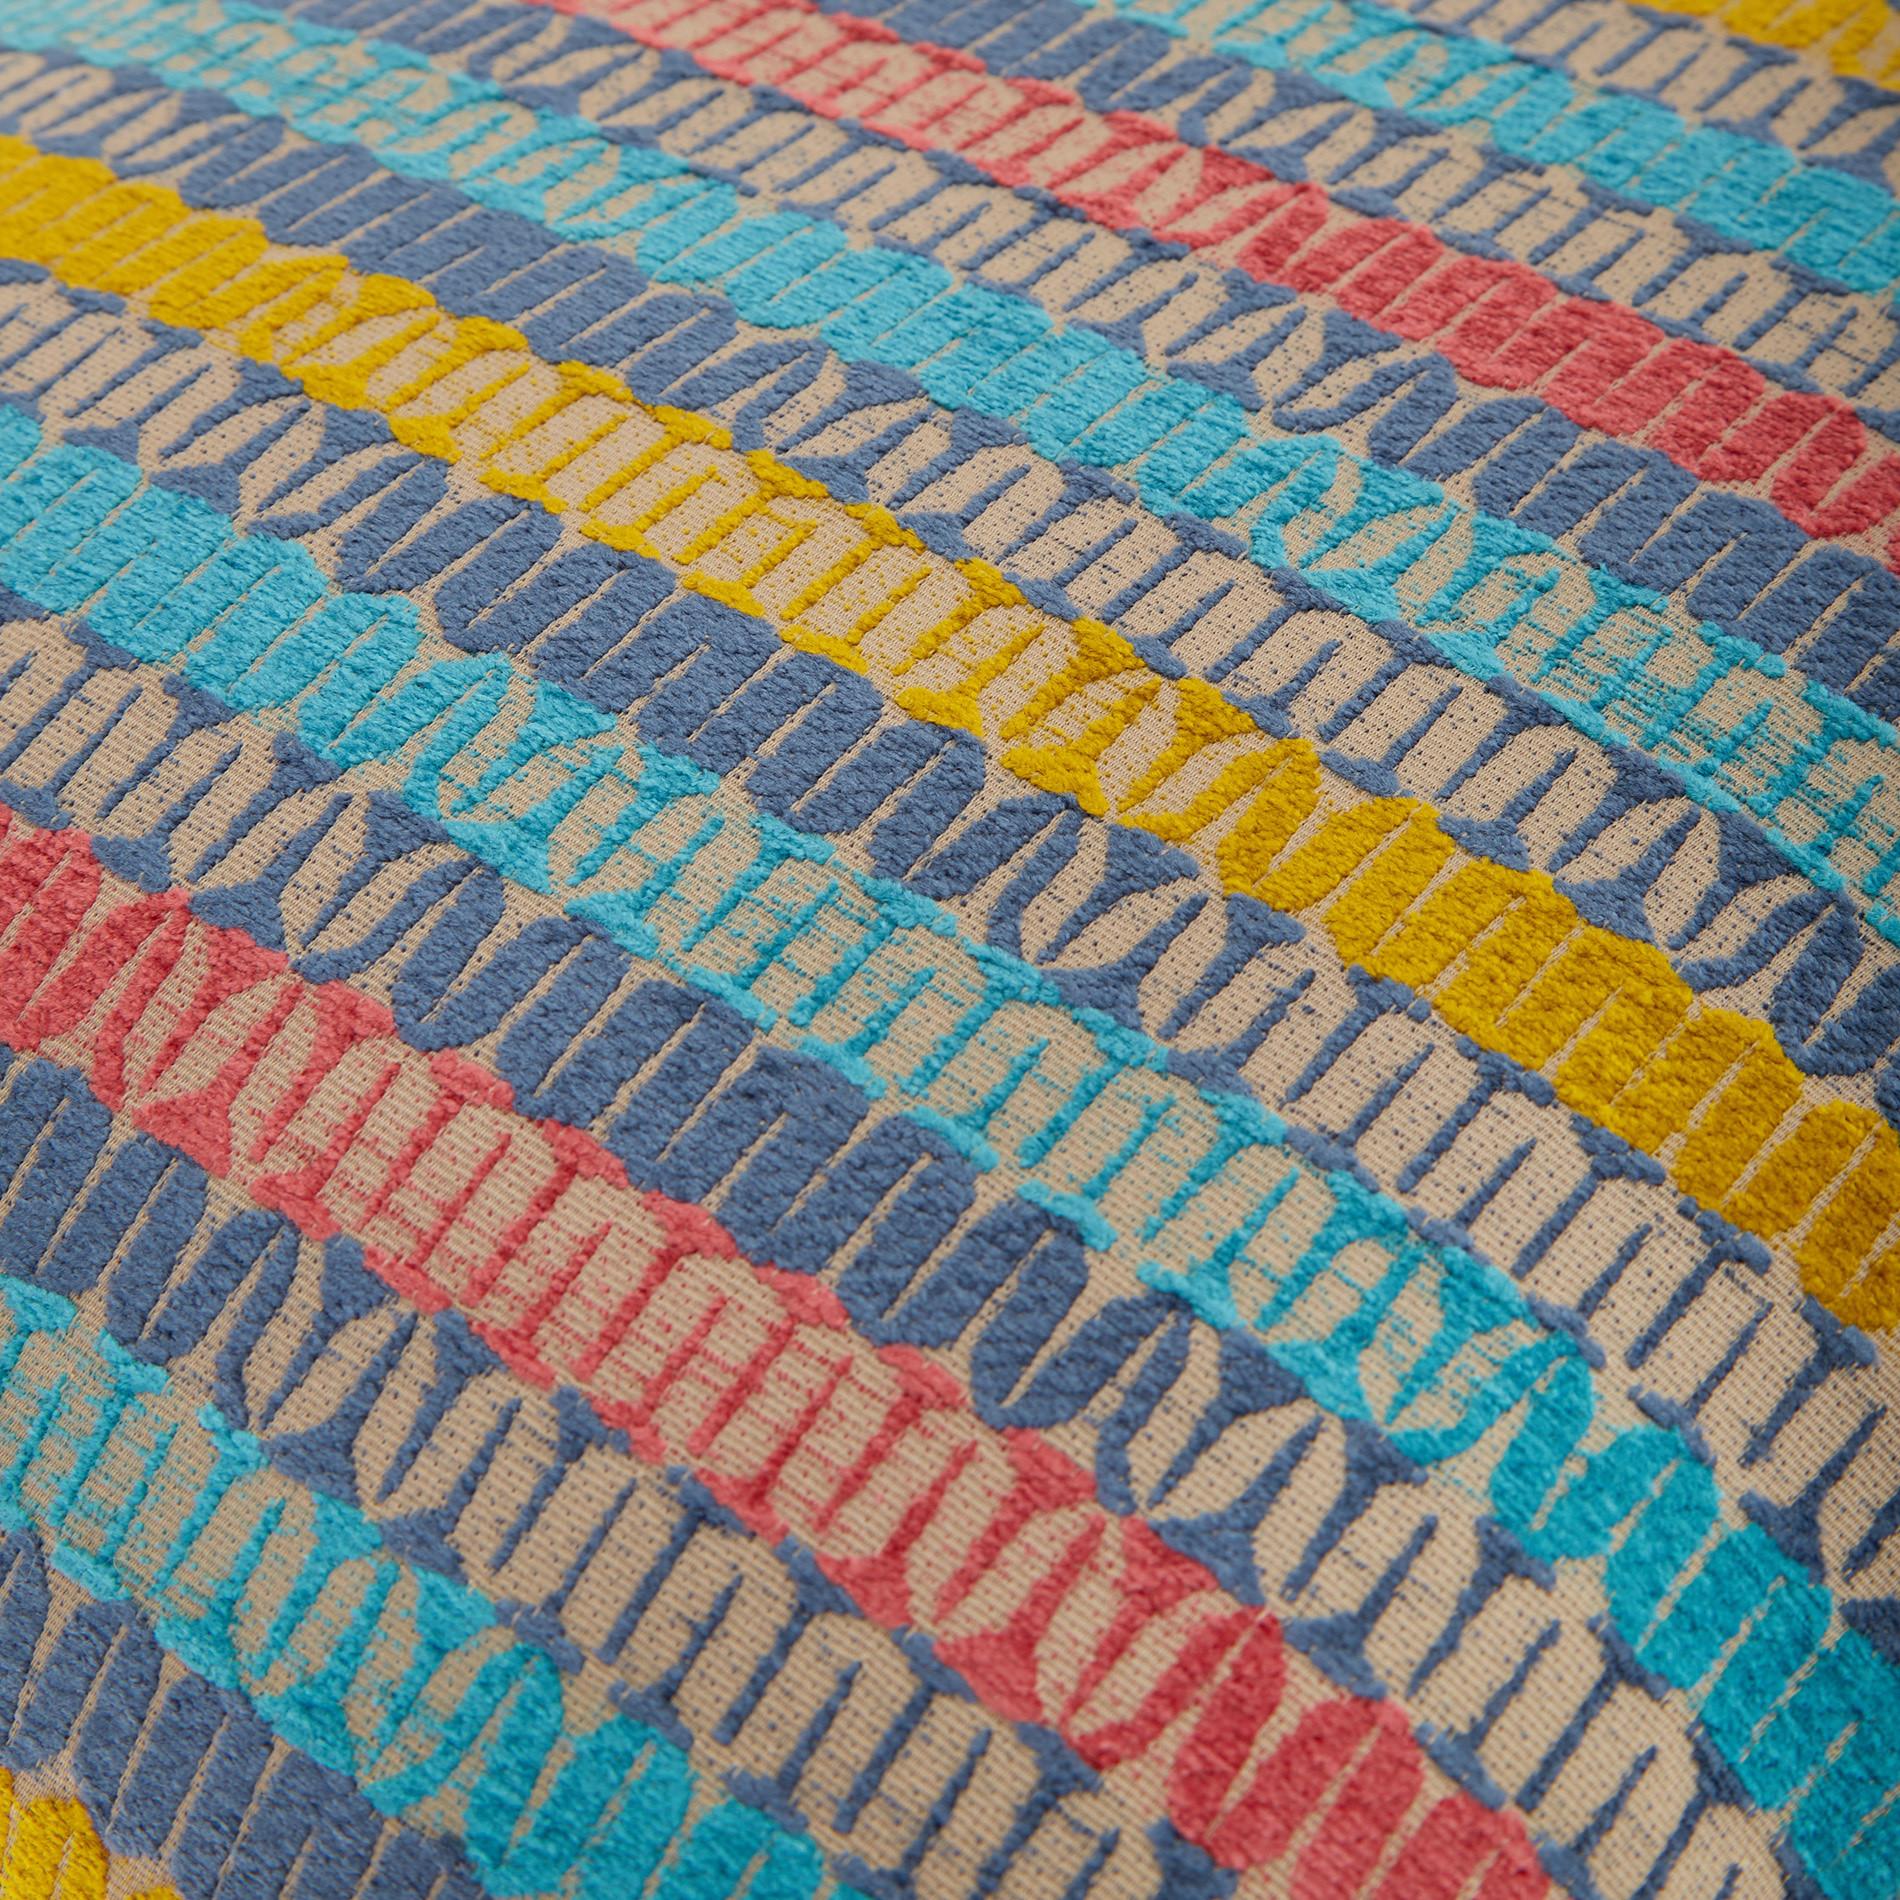 Cuscino jacquard motivo geometrico 43x43cm, Multicolor, large image number 3